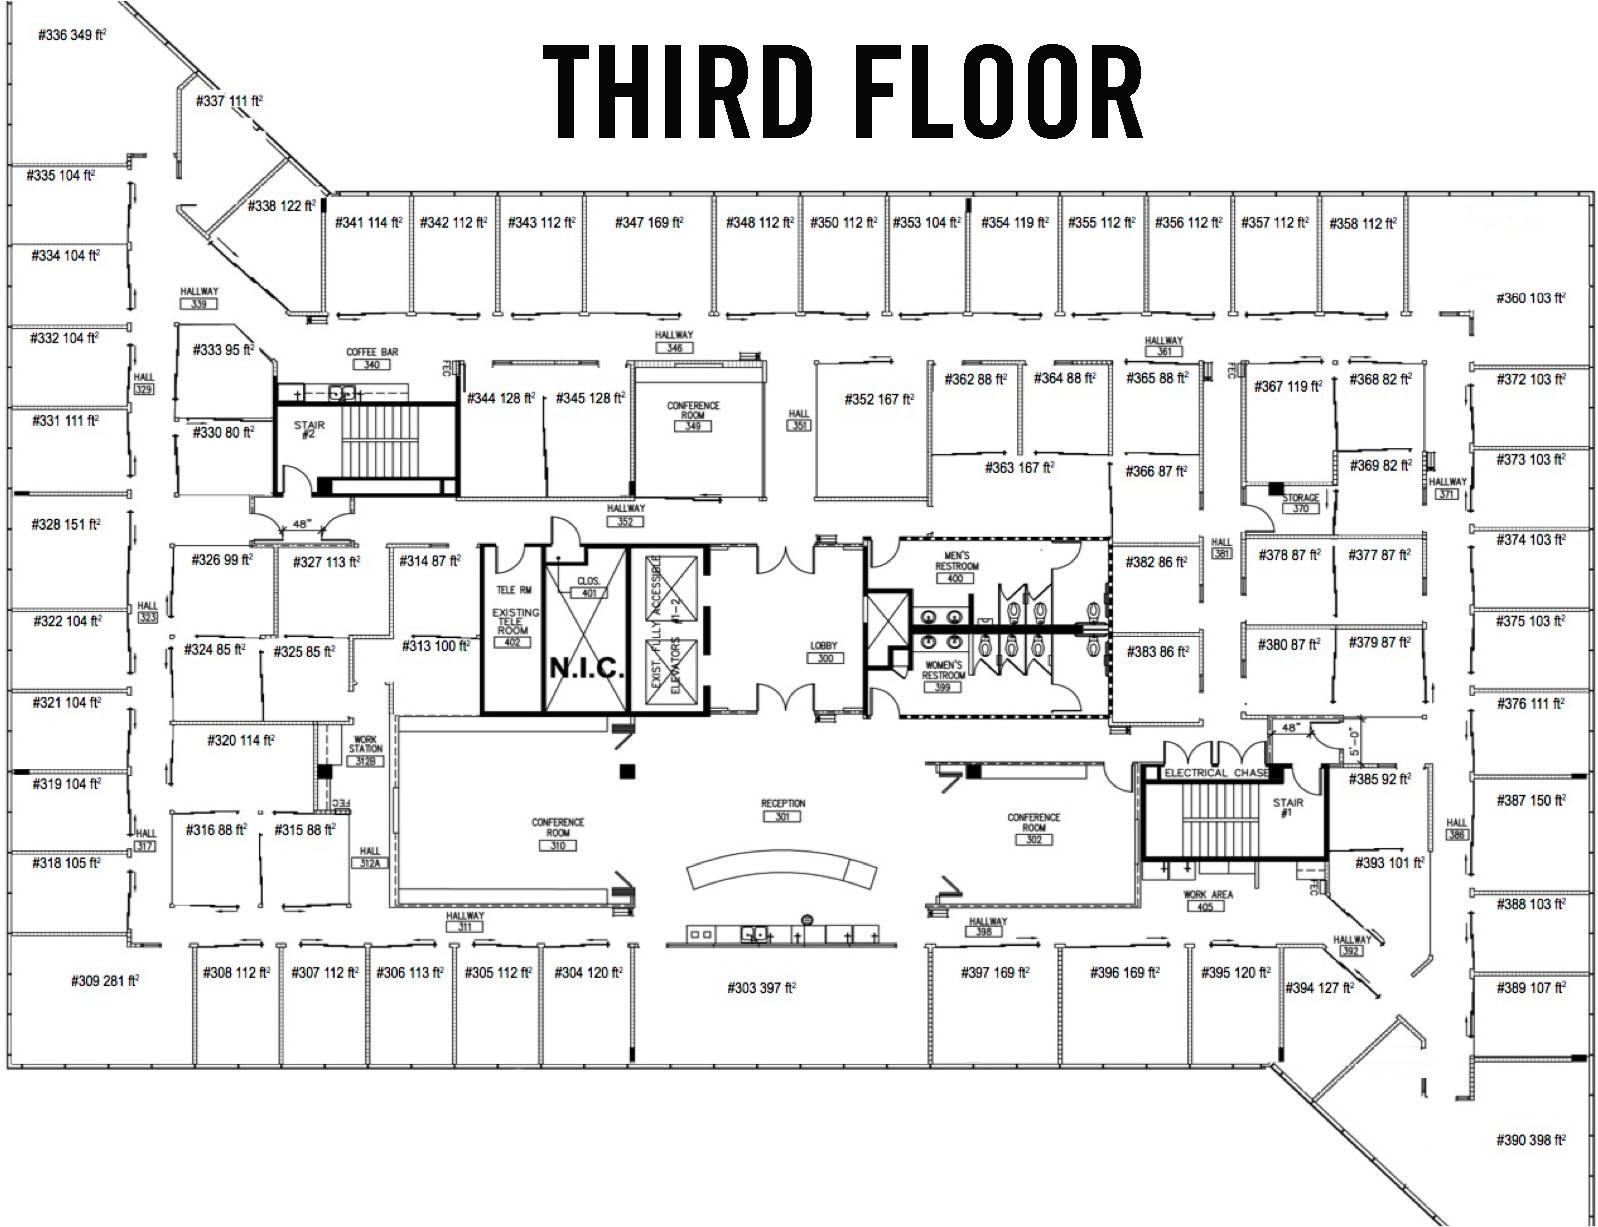 3rd floor map.jpg